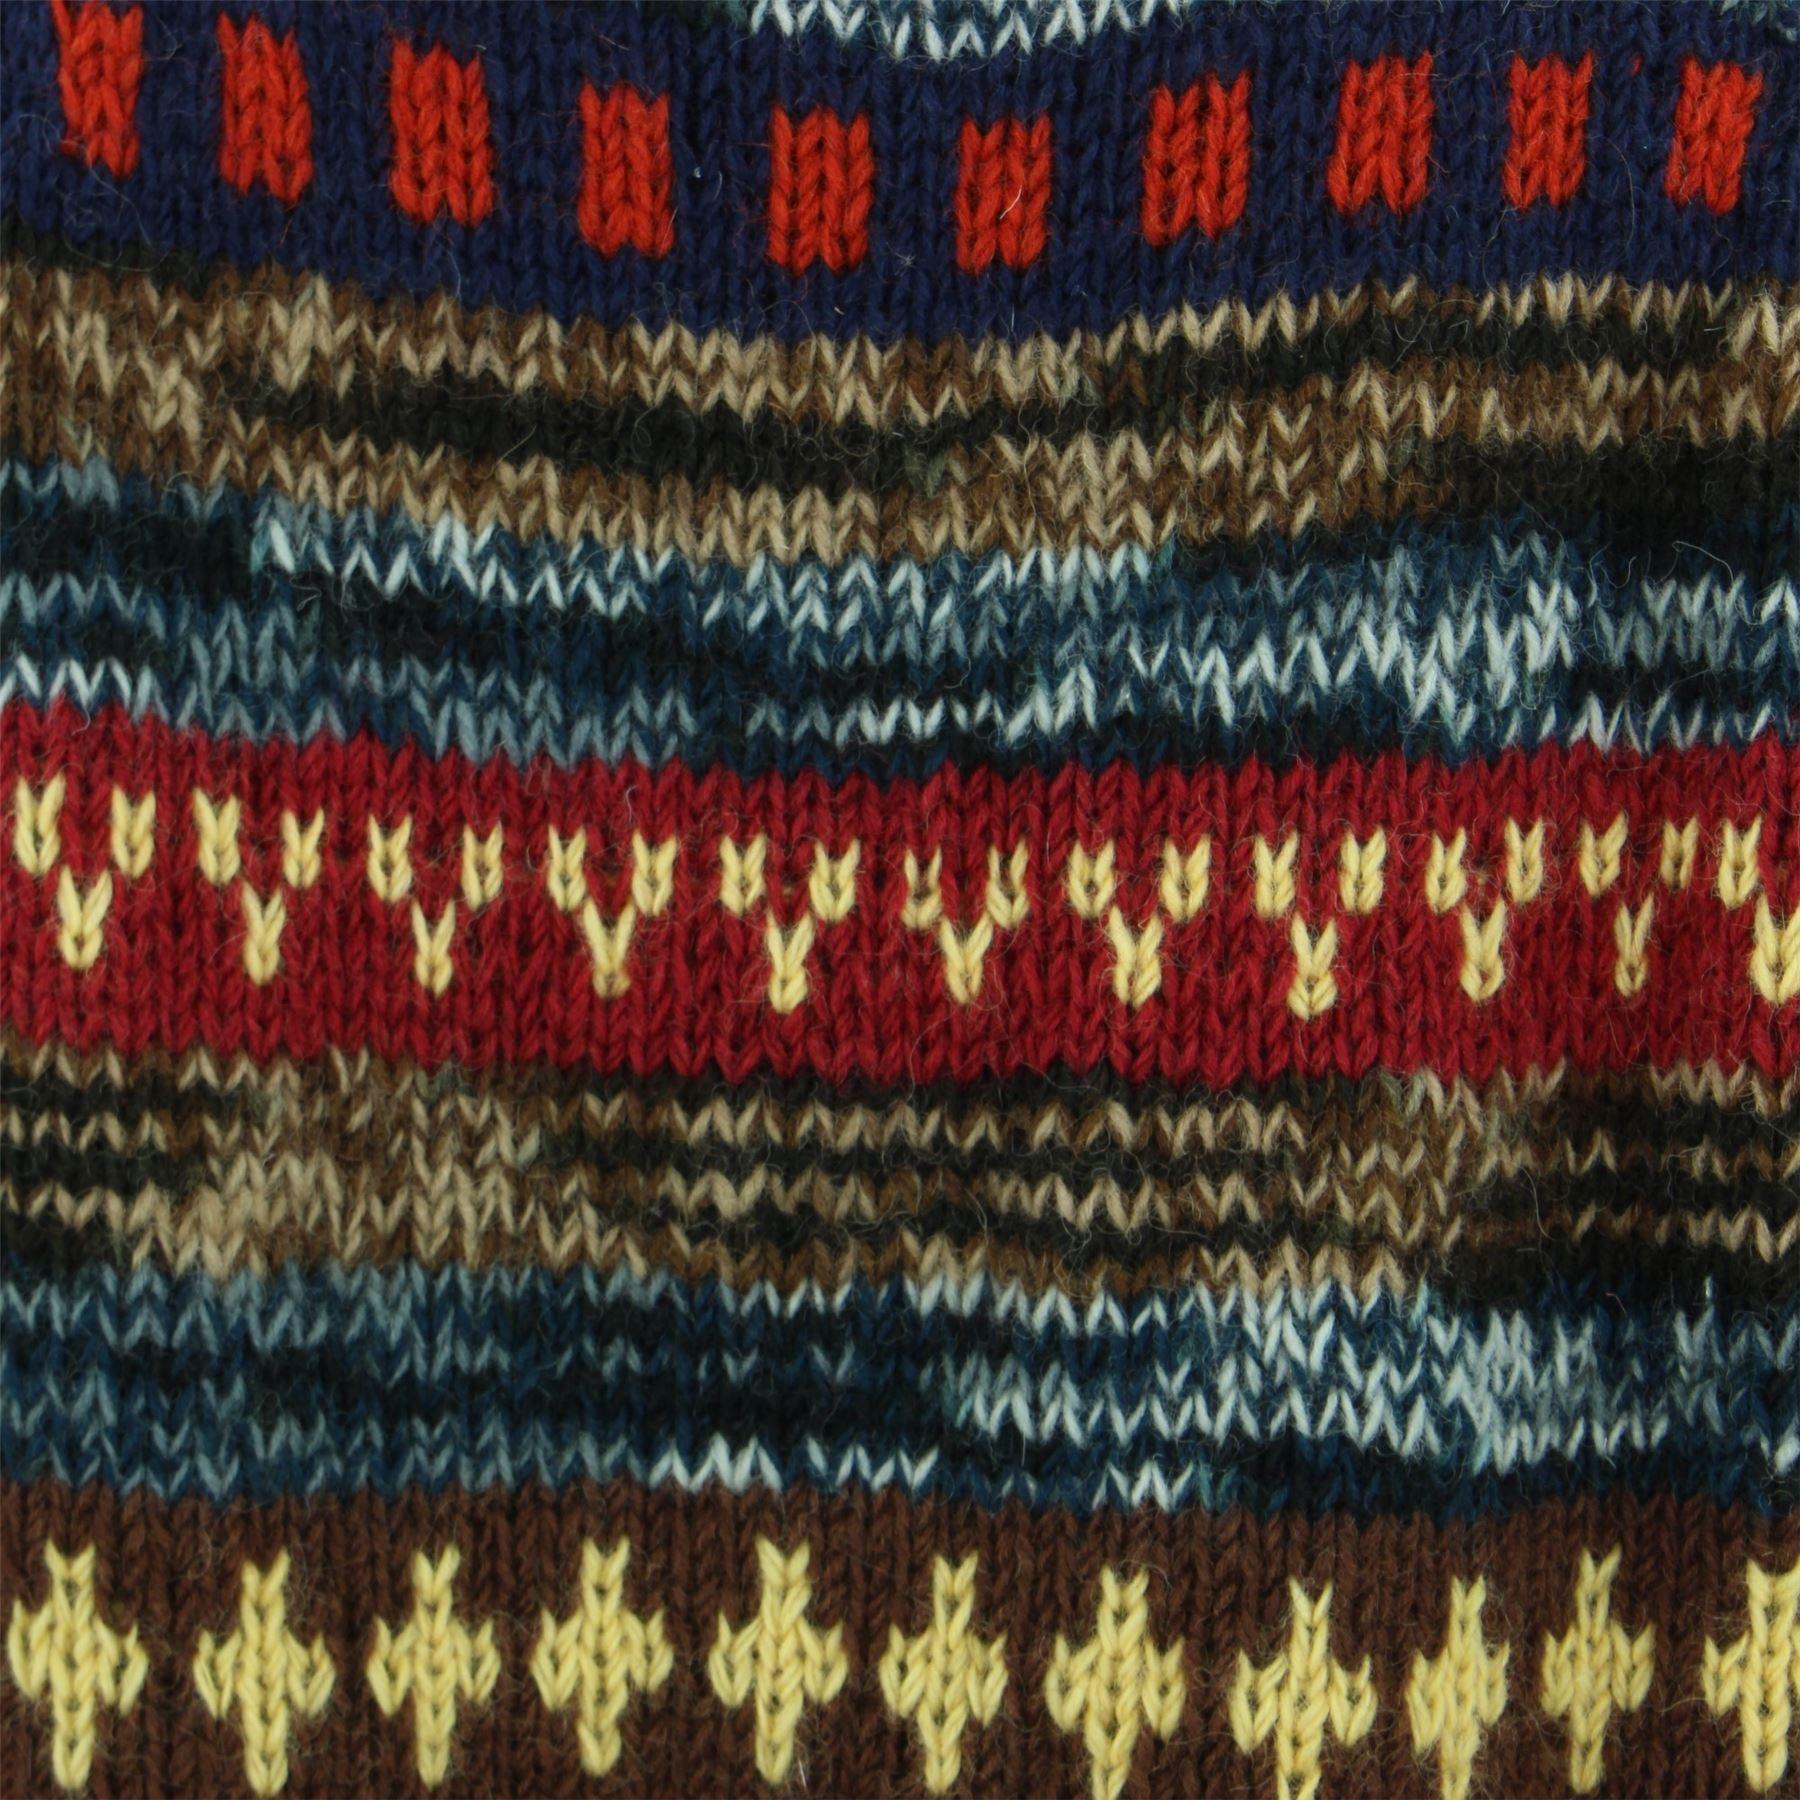 thumbnail 8 - Wool Knit Jumper Sweater Pullover Fairisle Nordic Abstract Warm Nepal Loose